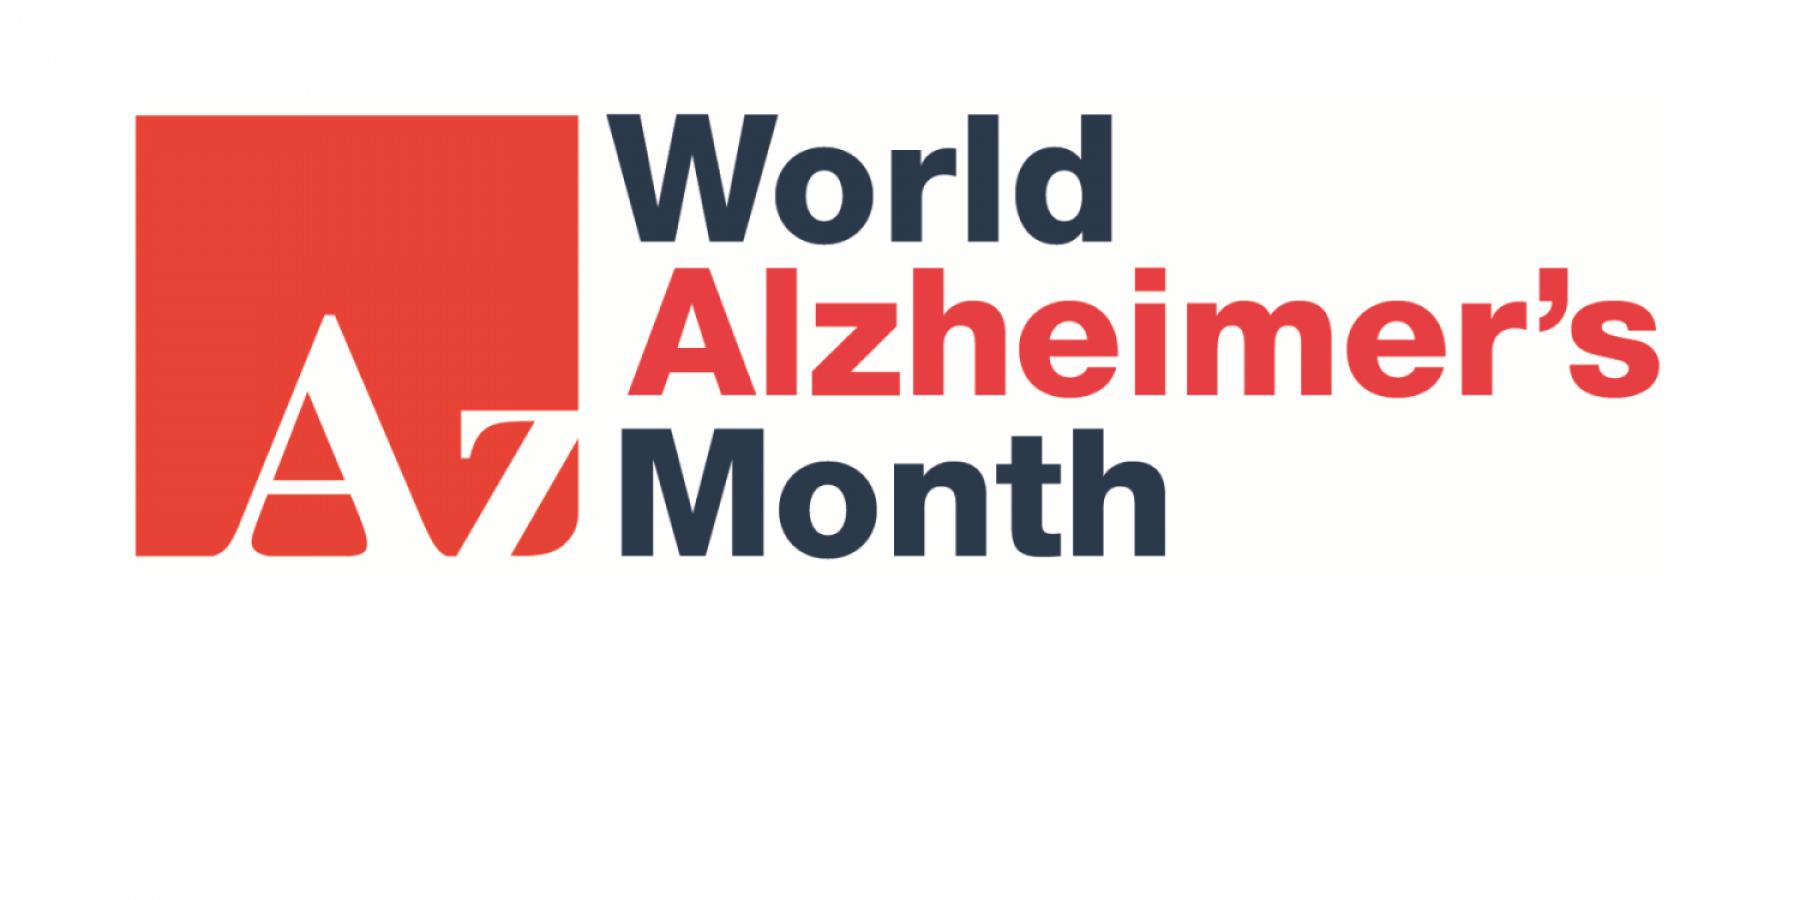 World Alzheimer's Month logo